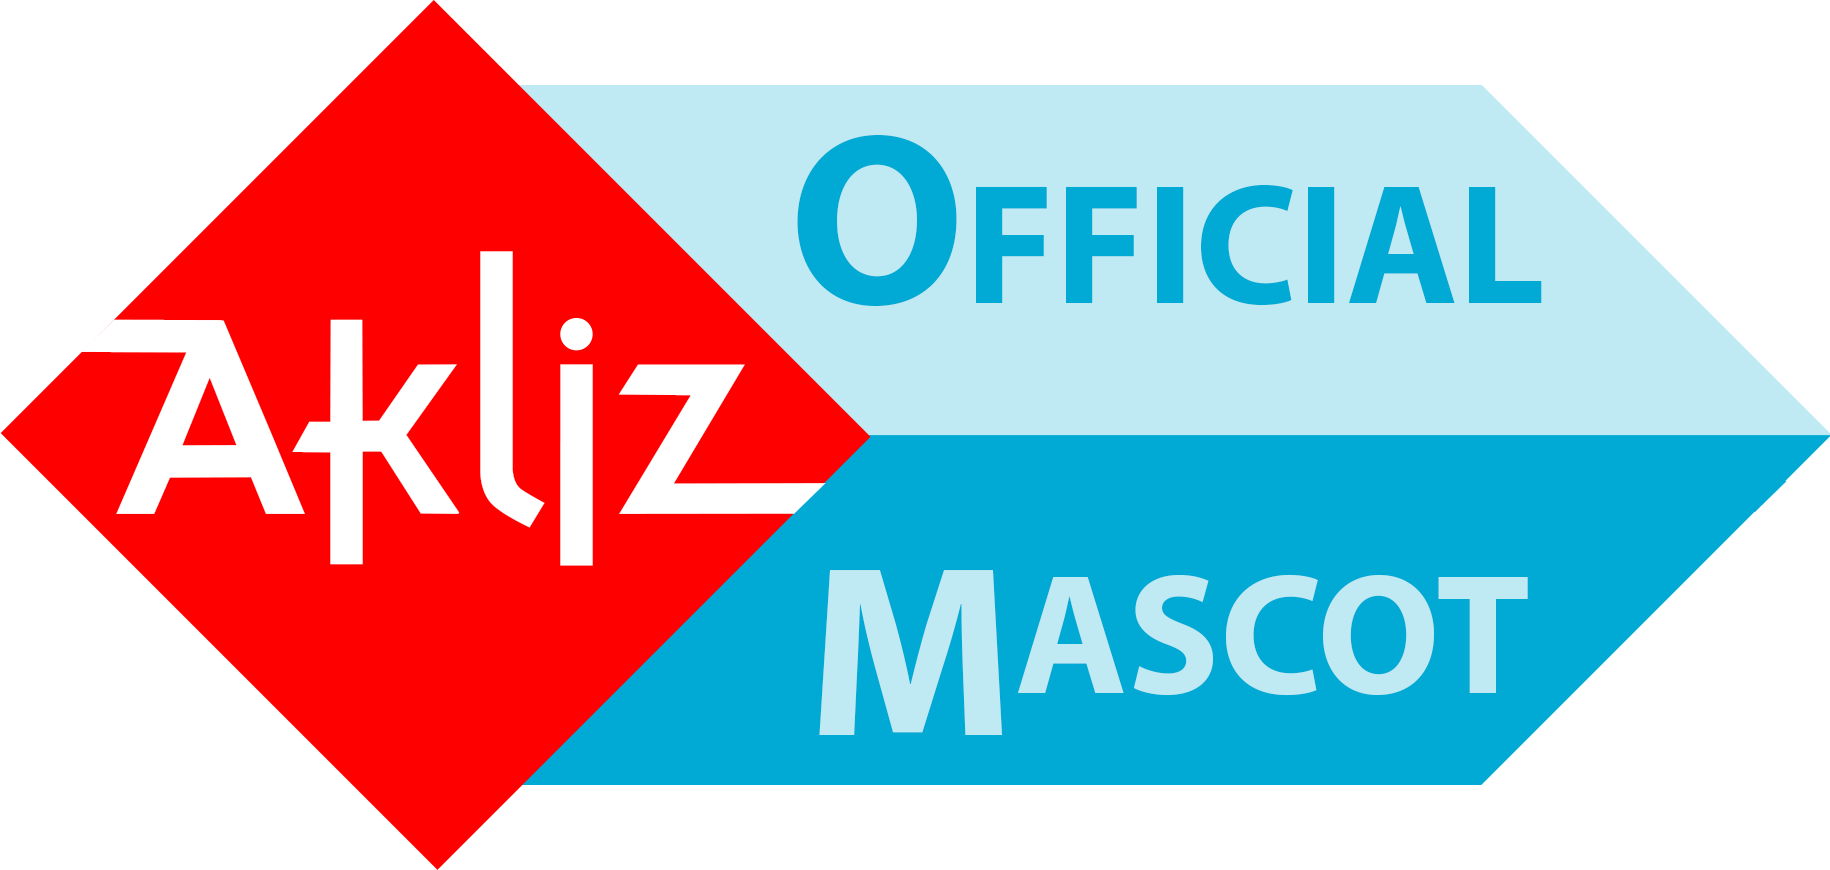 Official Mascot Badge